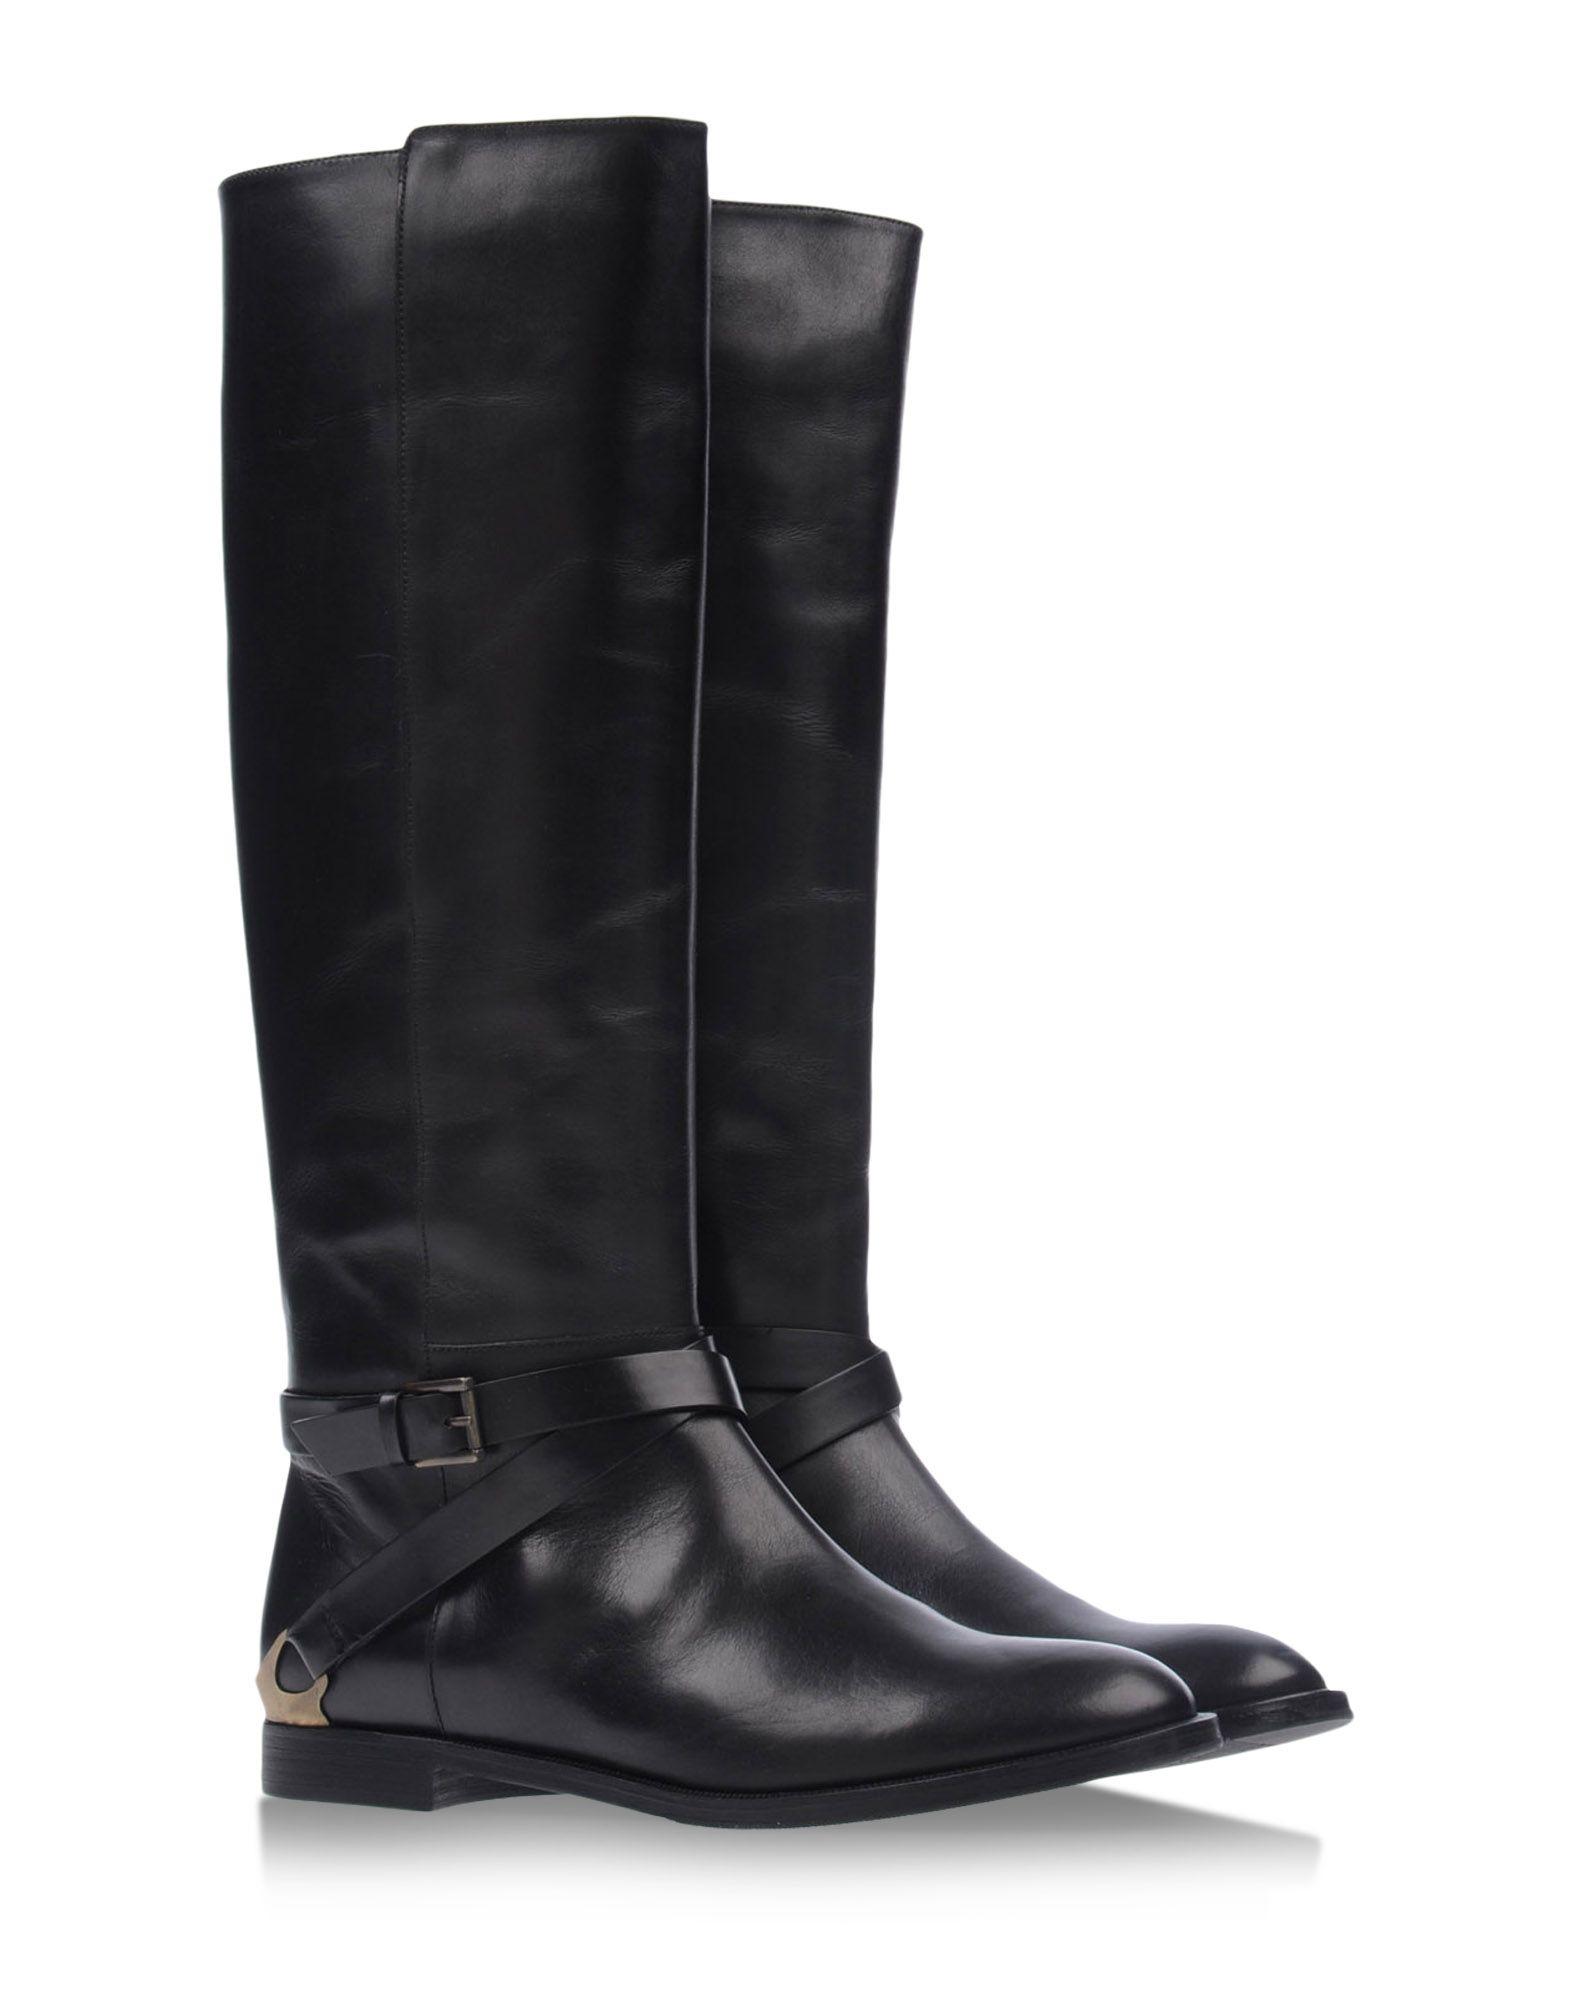 Fratelli Rossetti Boots In Black Lyst